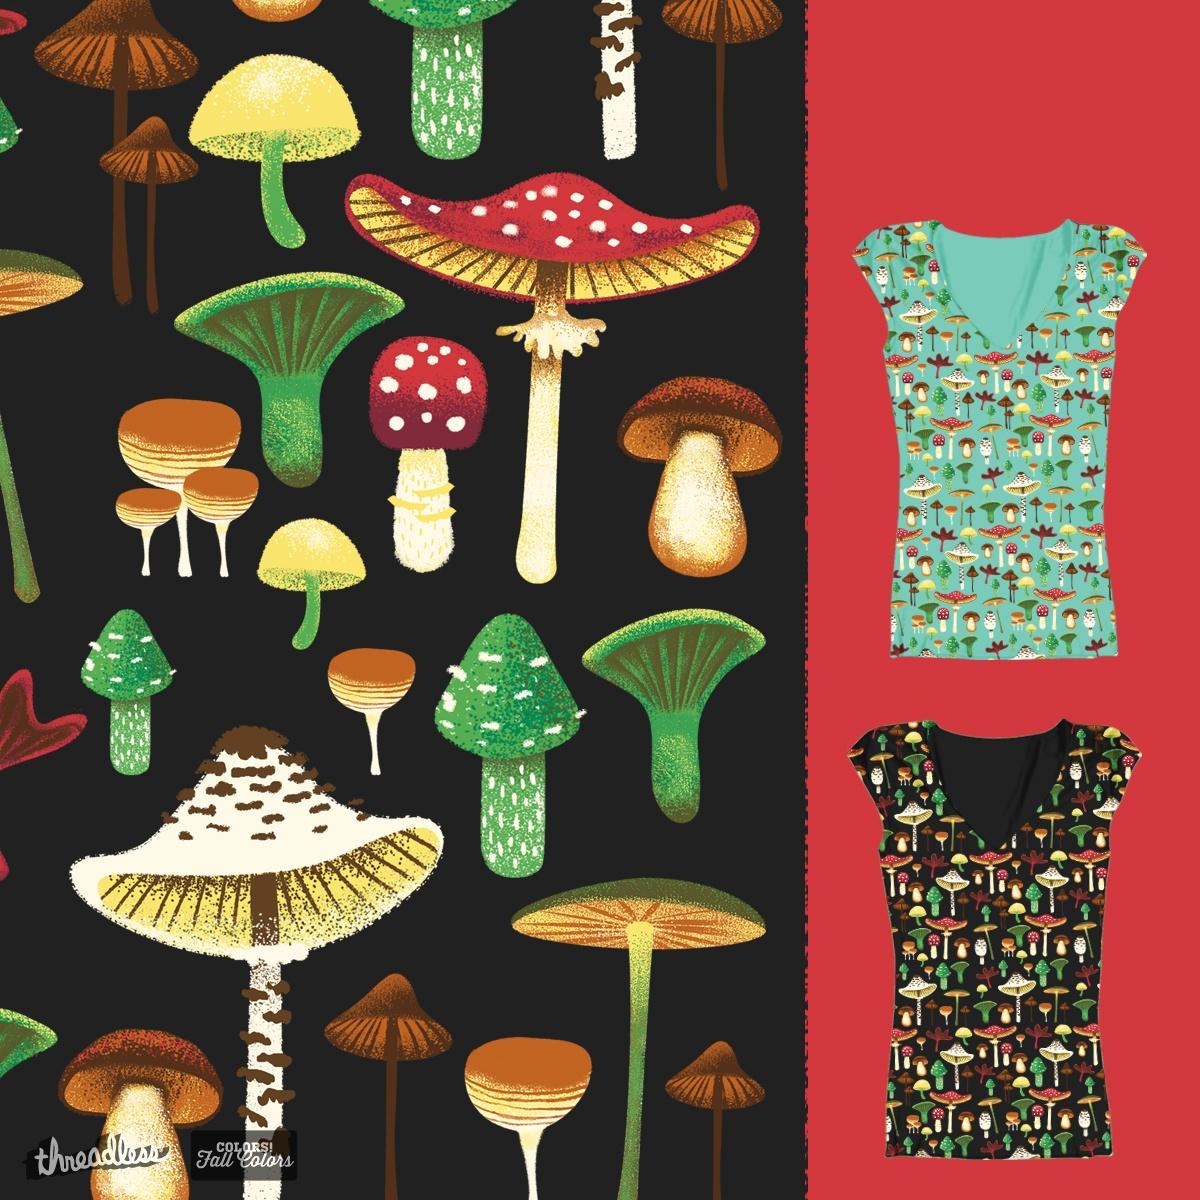 Mushroom pattern by deadsquirrel on Threadless